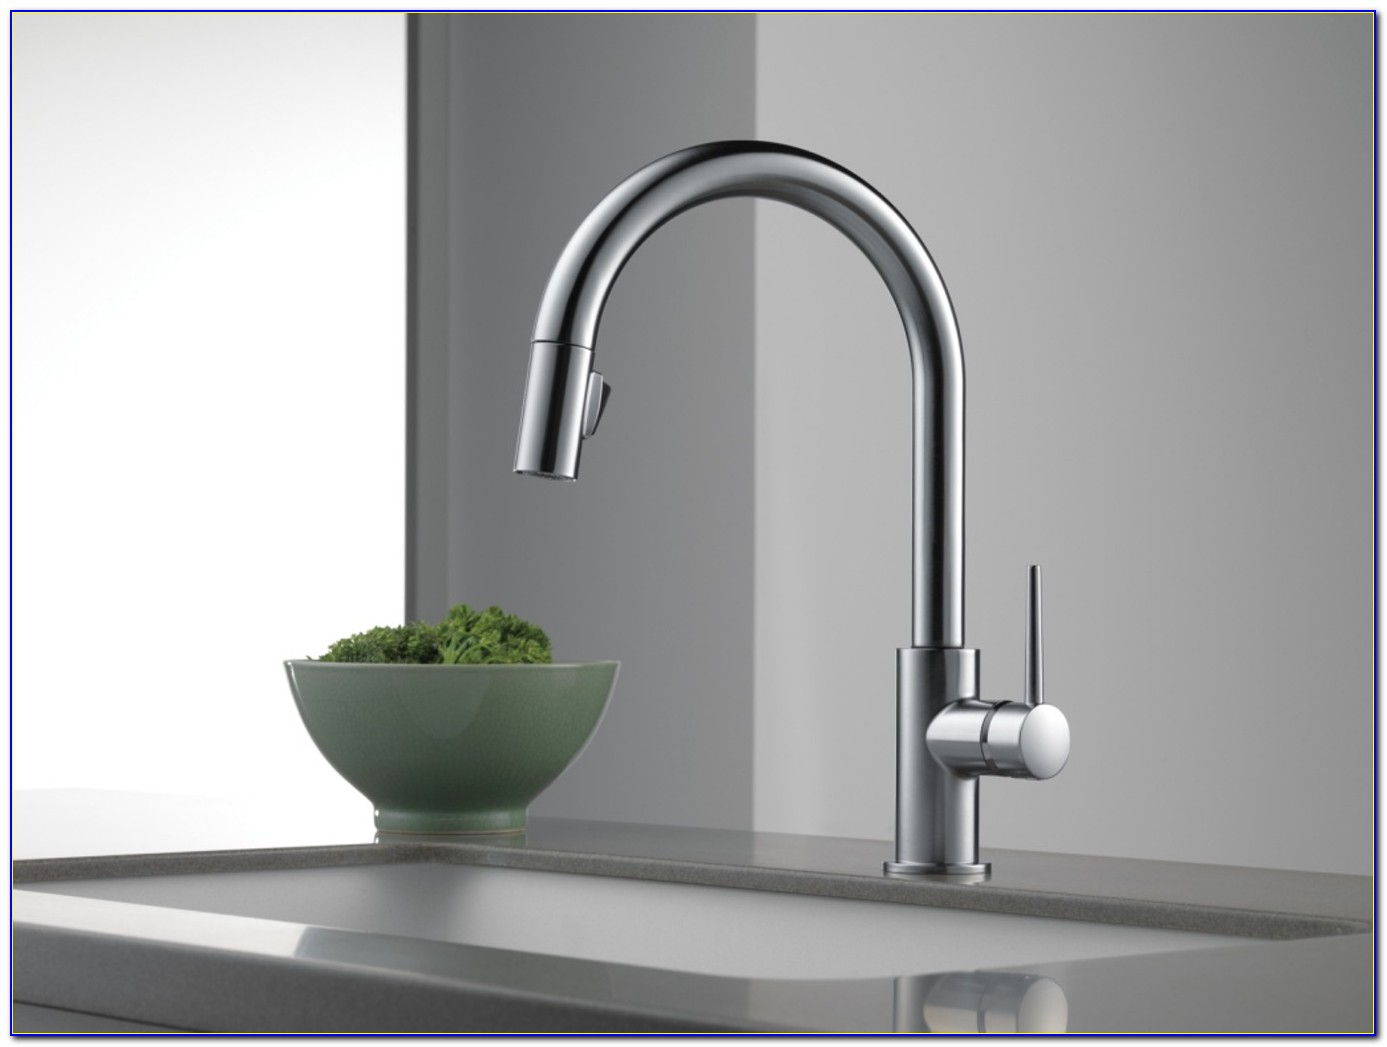 Moen Hands Free Kitchen Faucet Manual